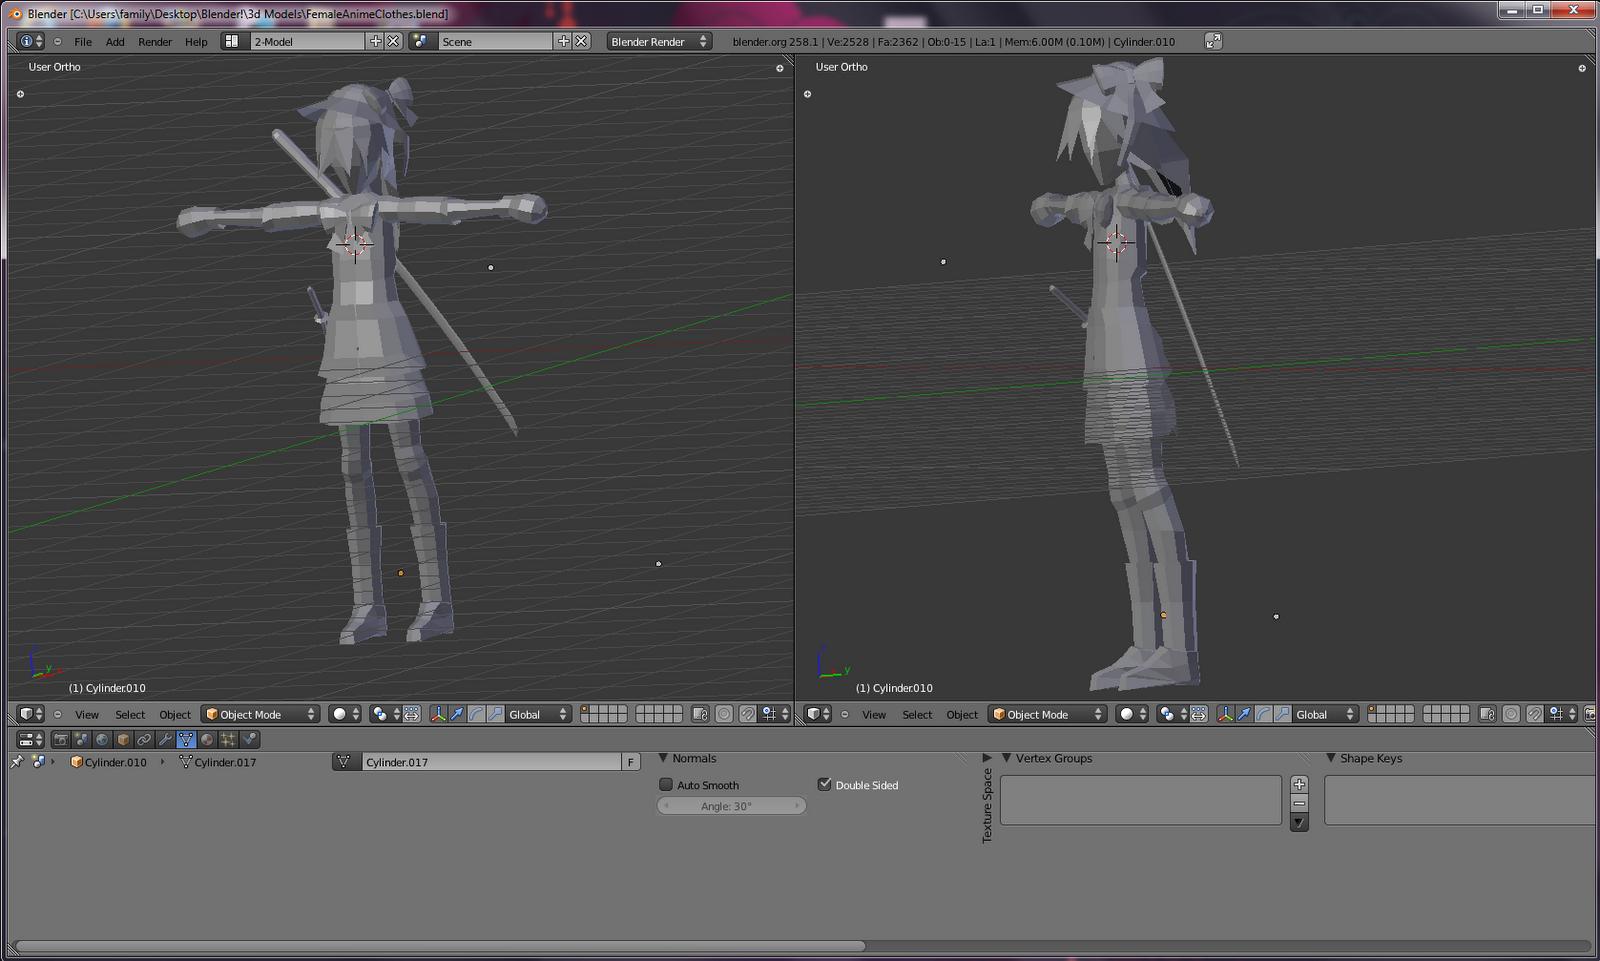 Samer Khatib's Dev Blog (SnowConeSolid): Early 3D Modeling